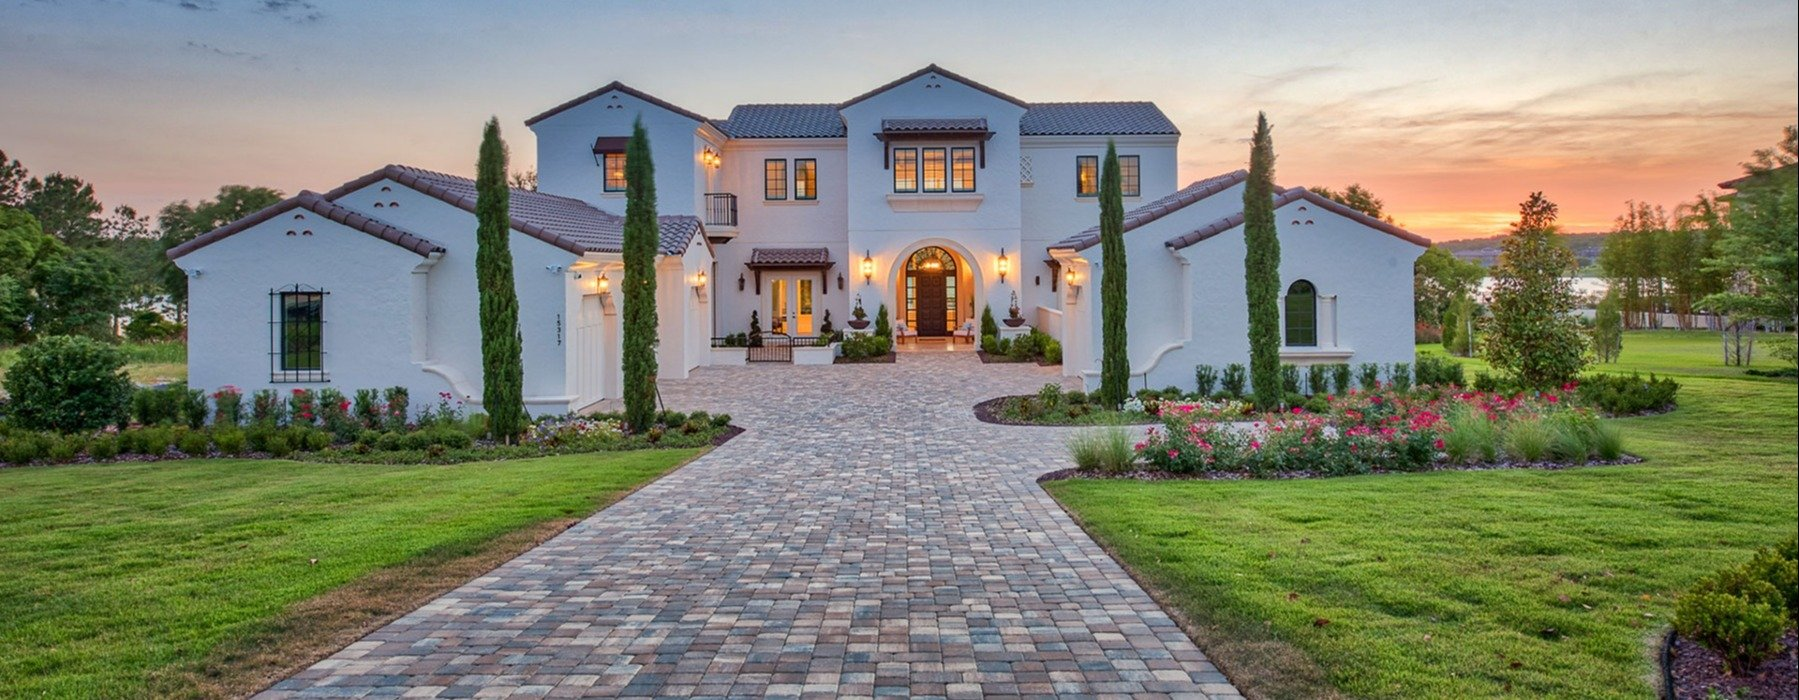 Custom-Built-Homes-1